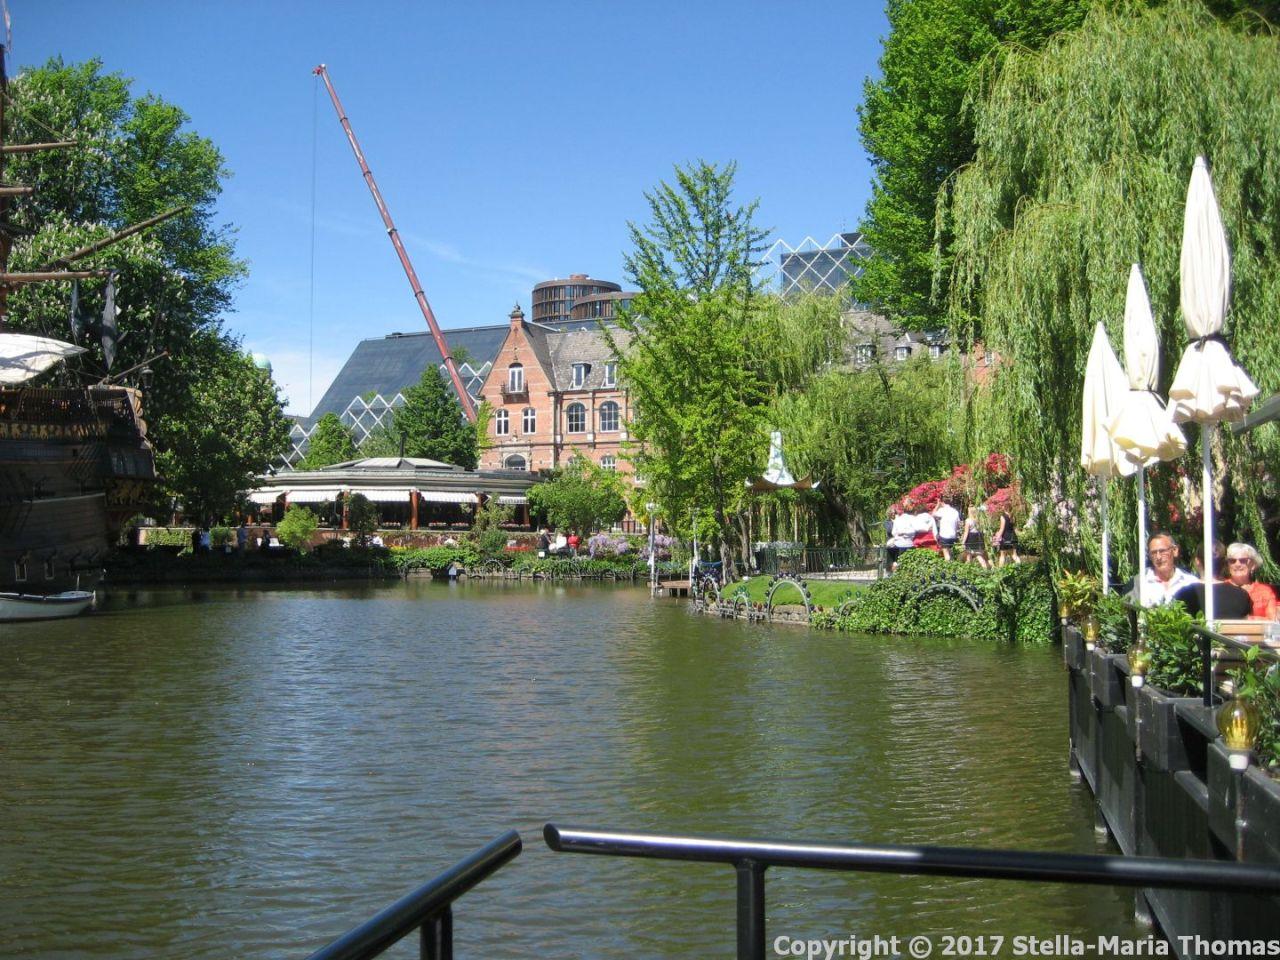 faergekroen-bryghus-tivoli-gardens-004_34575839170_o